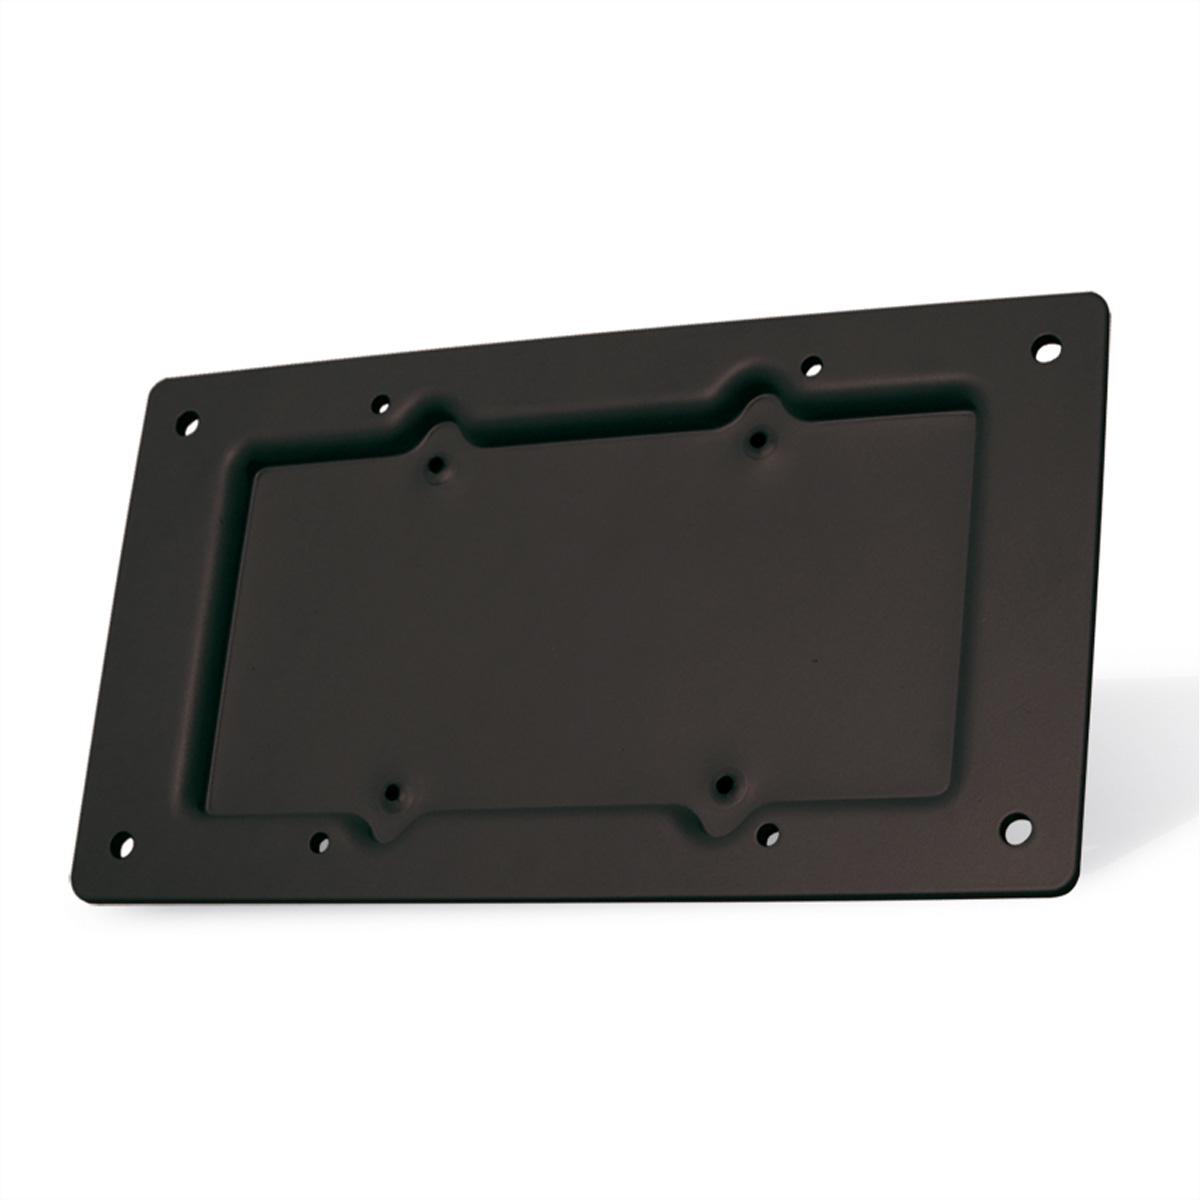 ROTRONIC-SECOMP Vesa Adapter 75x75 auf 100x200 - Zubehör TFT/LCD-TV